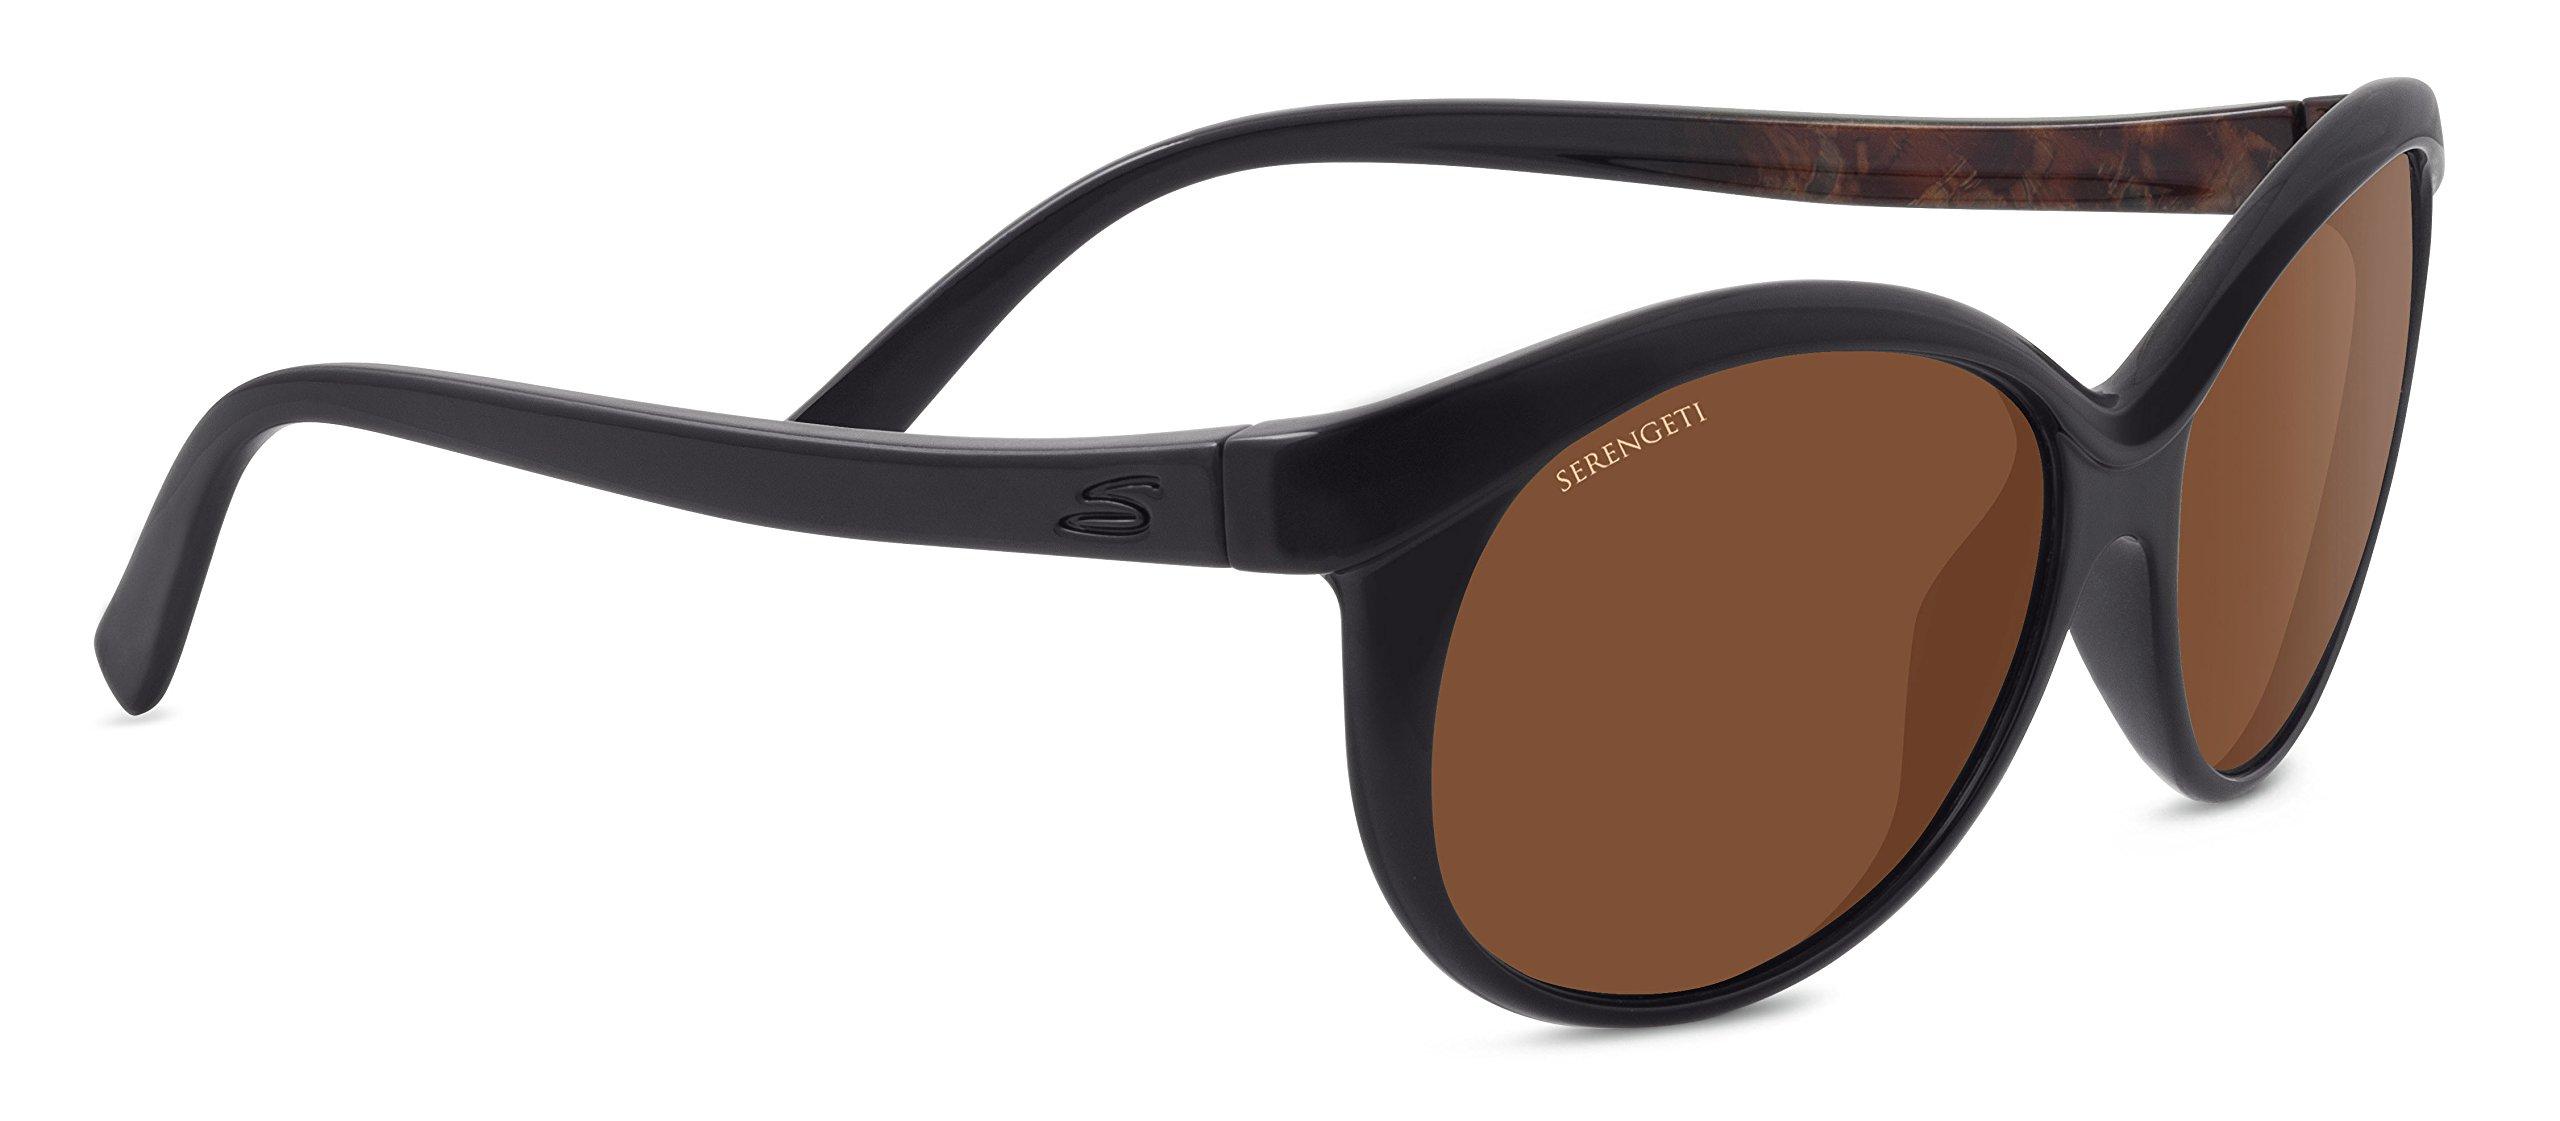 Serengeti 8186 Caterina, Shiny Black/Brown Wood Frame, Polarized Drivers Lens